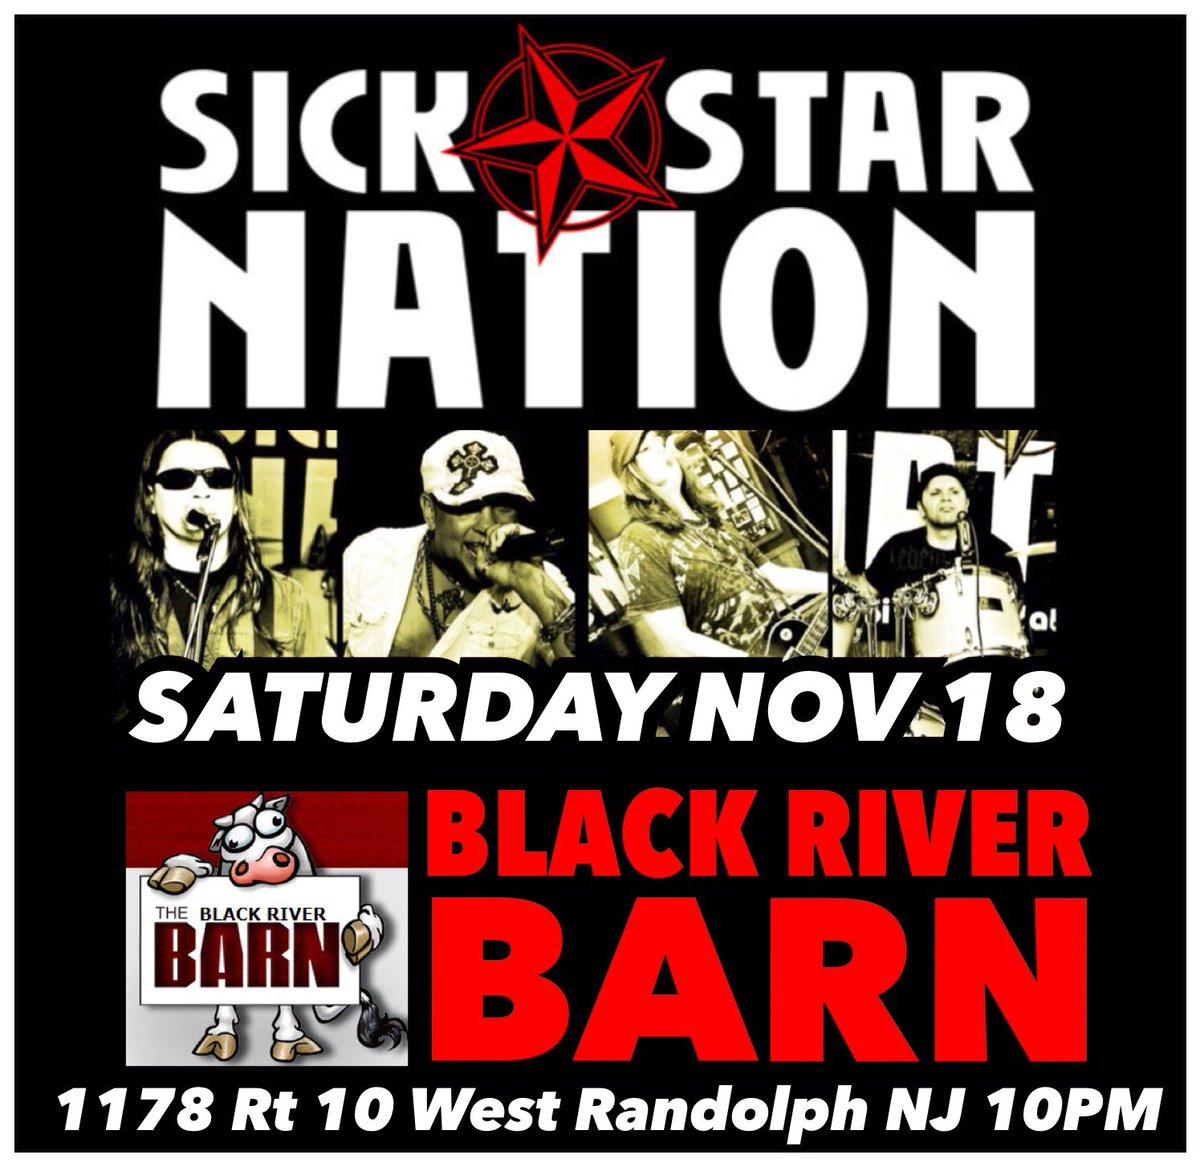 Sick Star Nation On Twitter Sat Nov 18 Black River Barn In